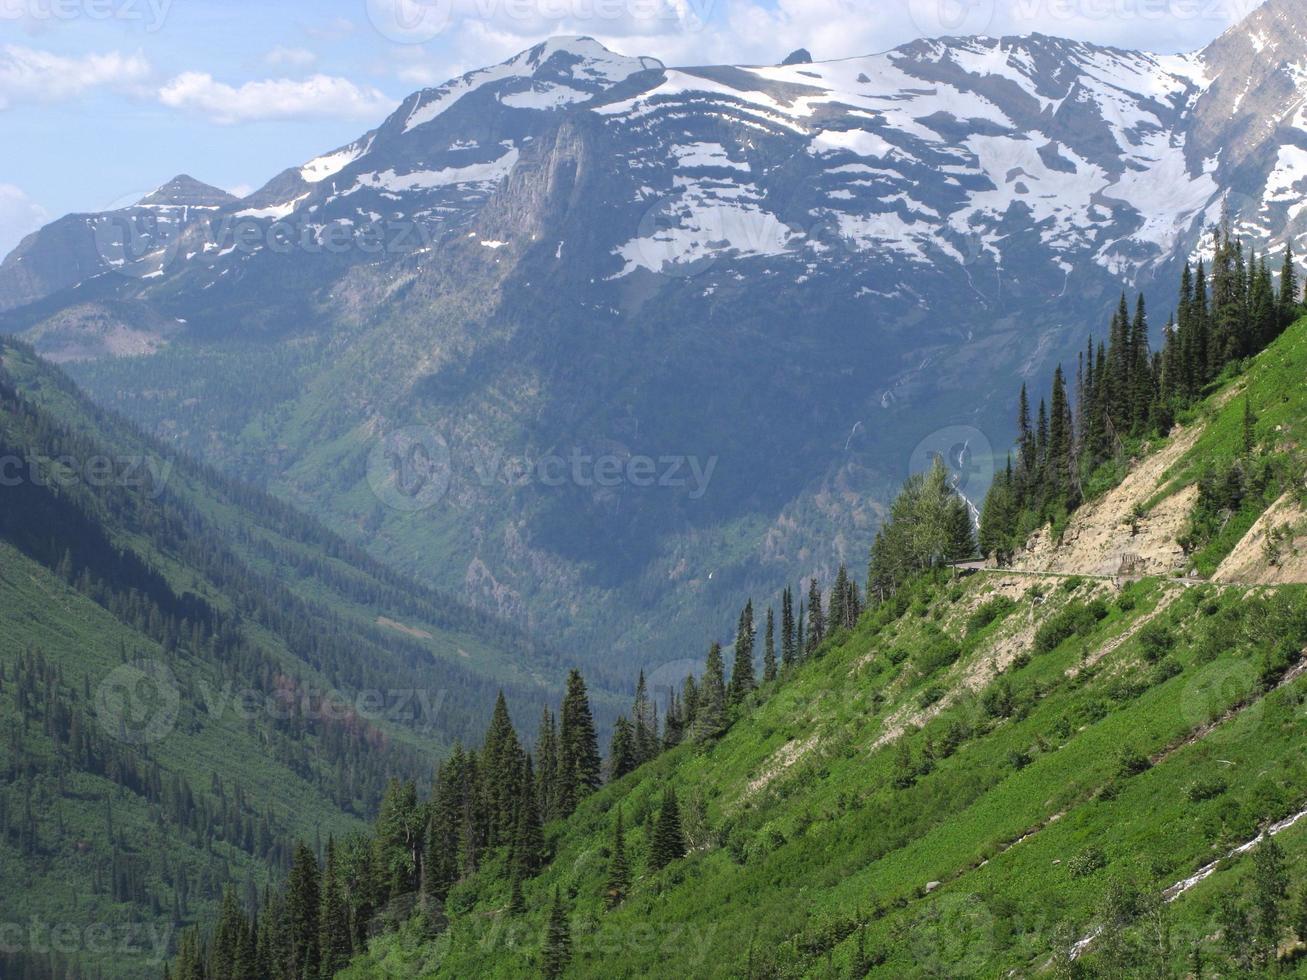 bergen gletsjer noorden cascades nationaal park foto